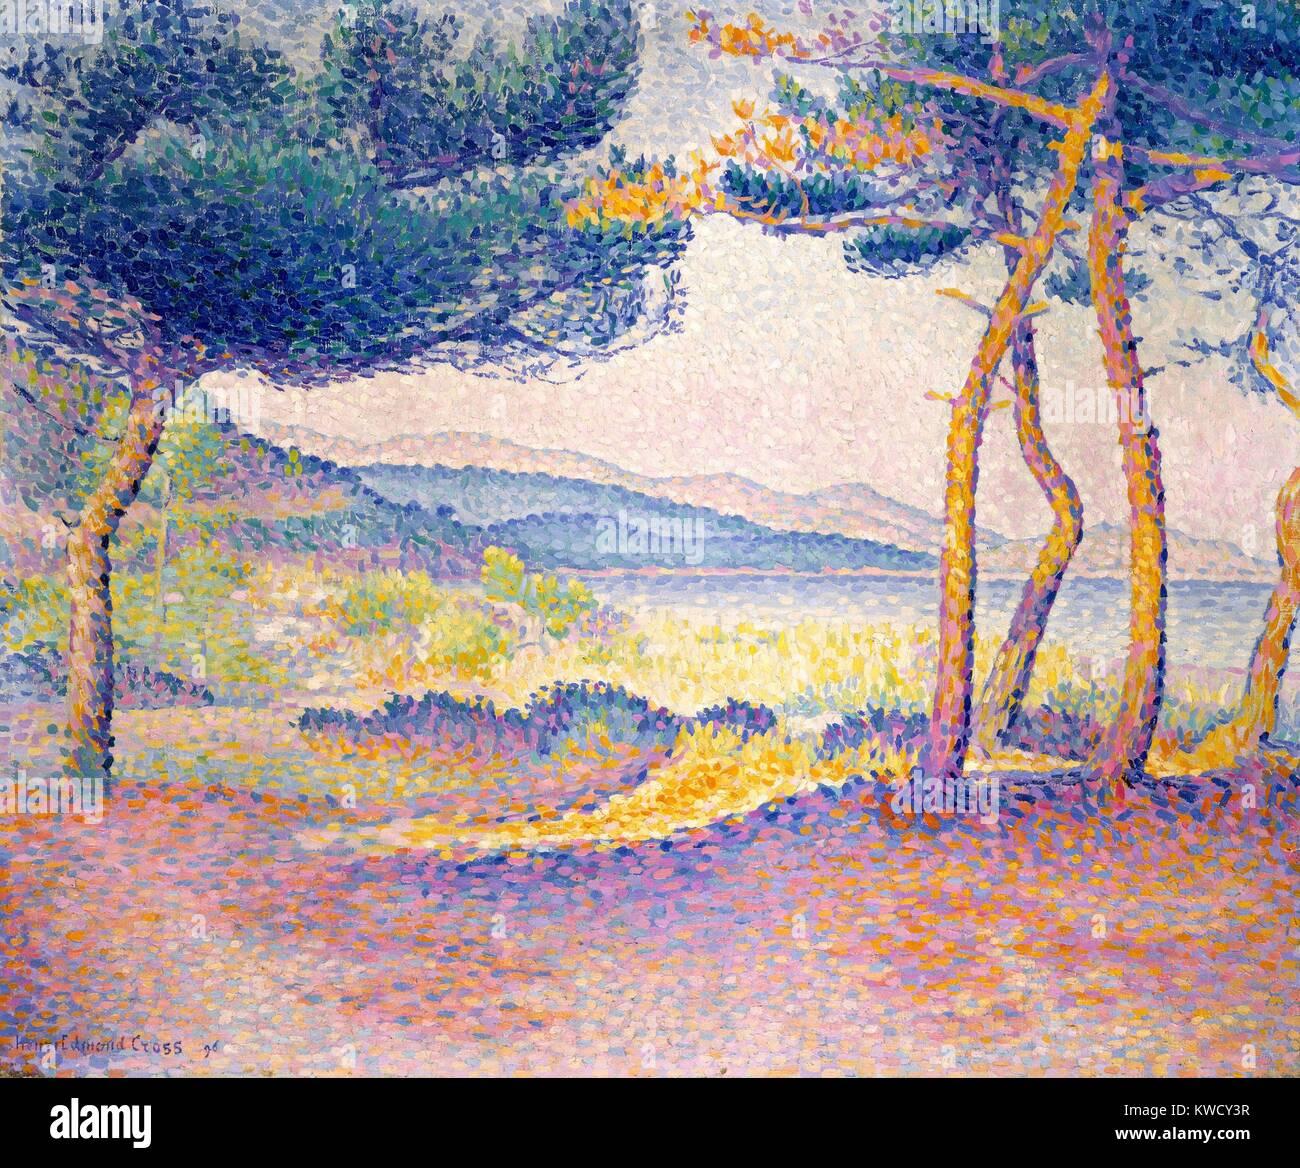 Neo Impressionism Artists: Divisionism Stock Photos & Divisionism Stock Images